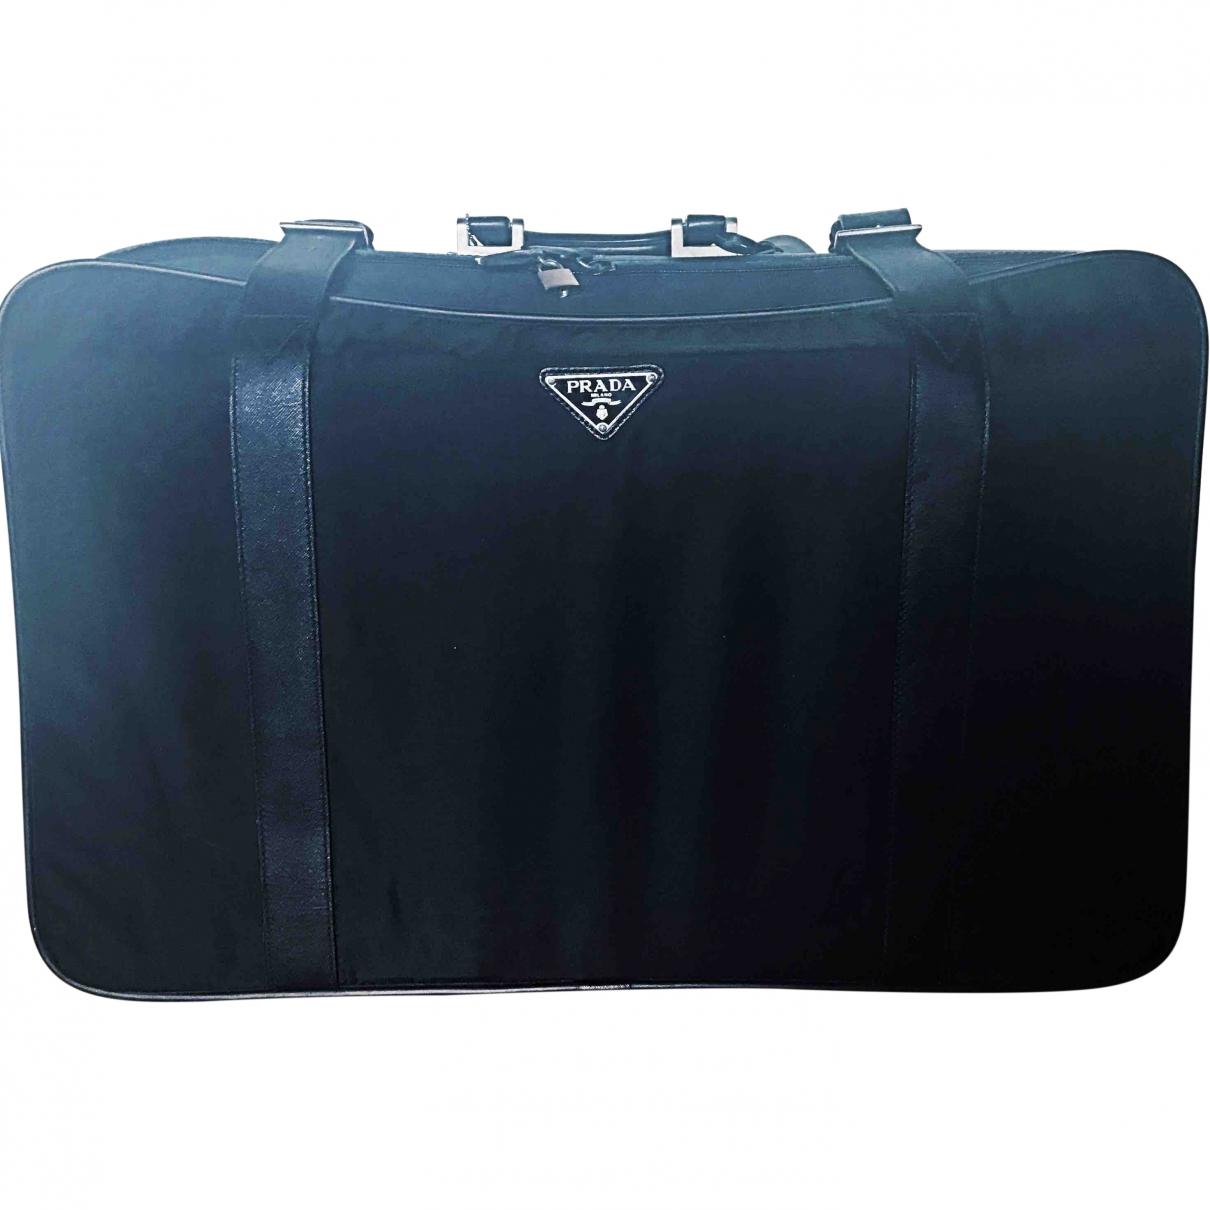 Prada \N Black Travel bag for Women \N